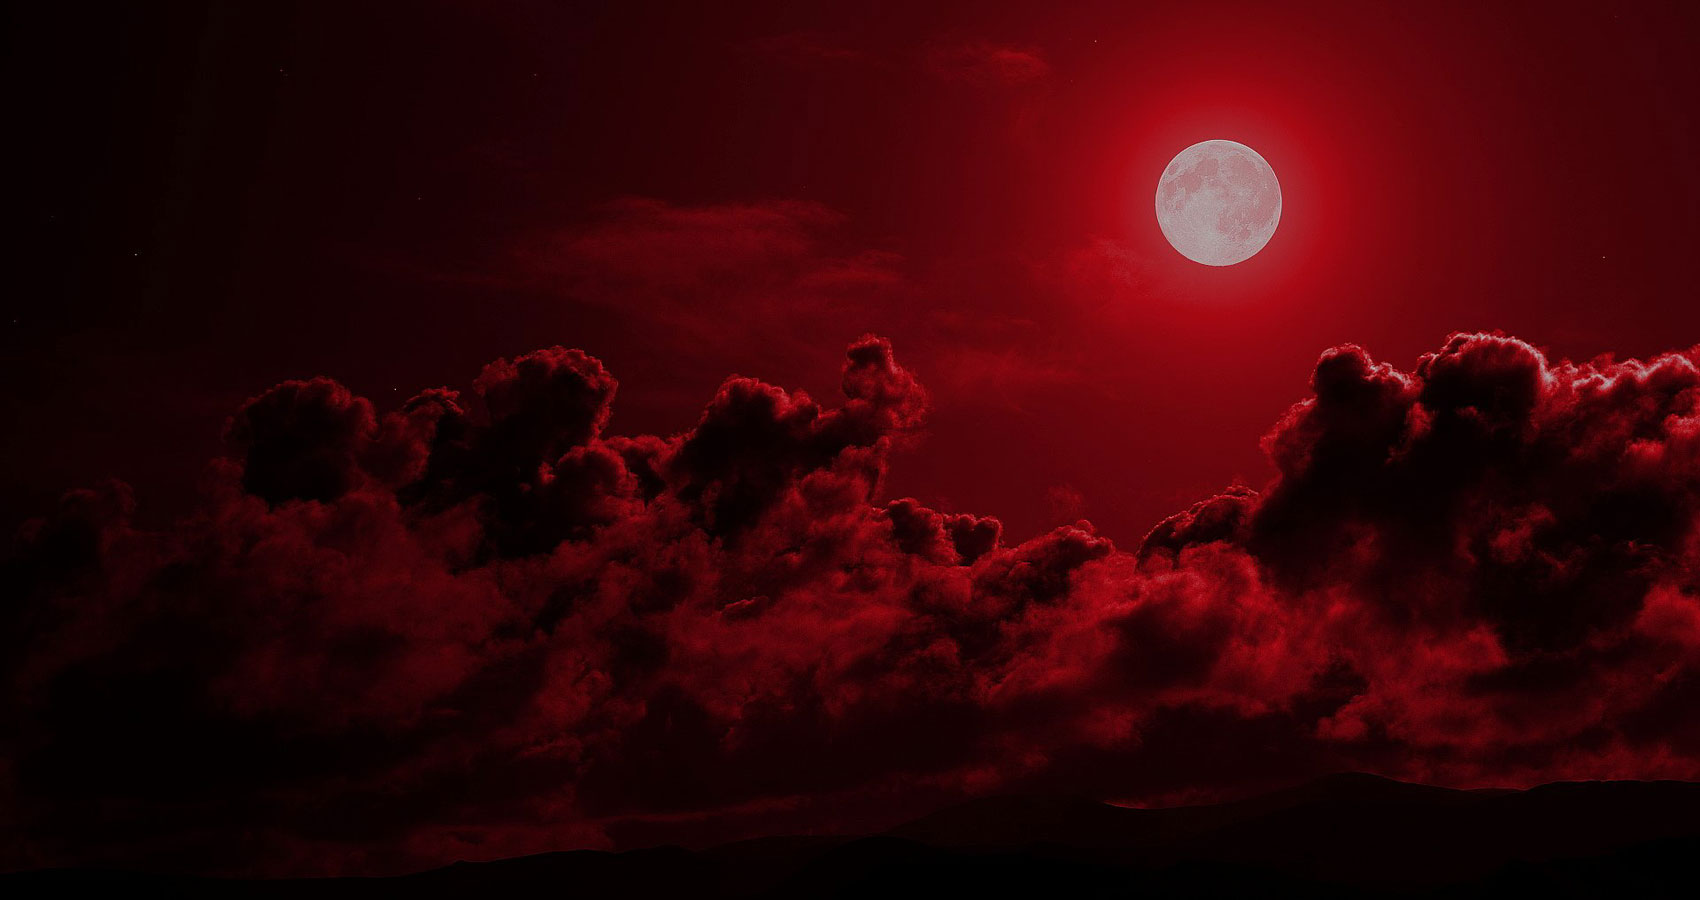 Luna Rossa written by Francesco Abate at Spillwords.com